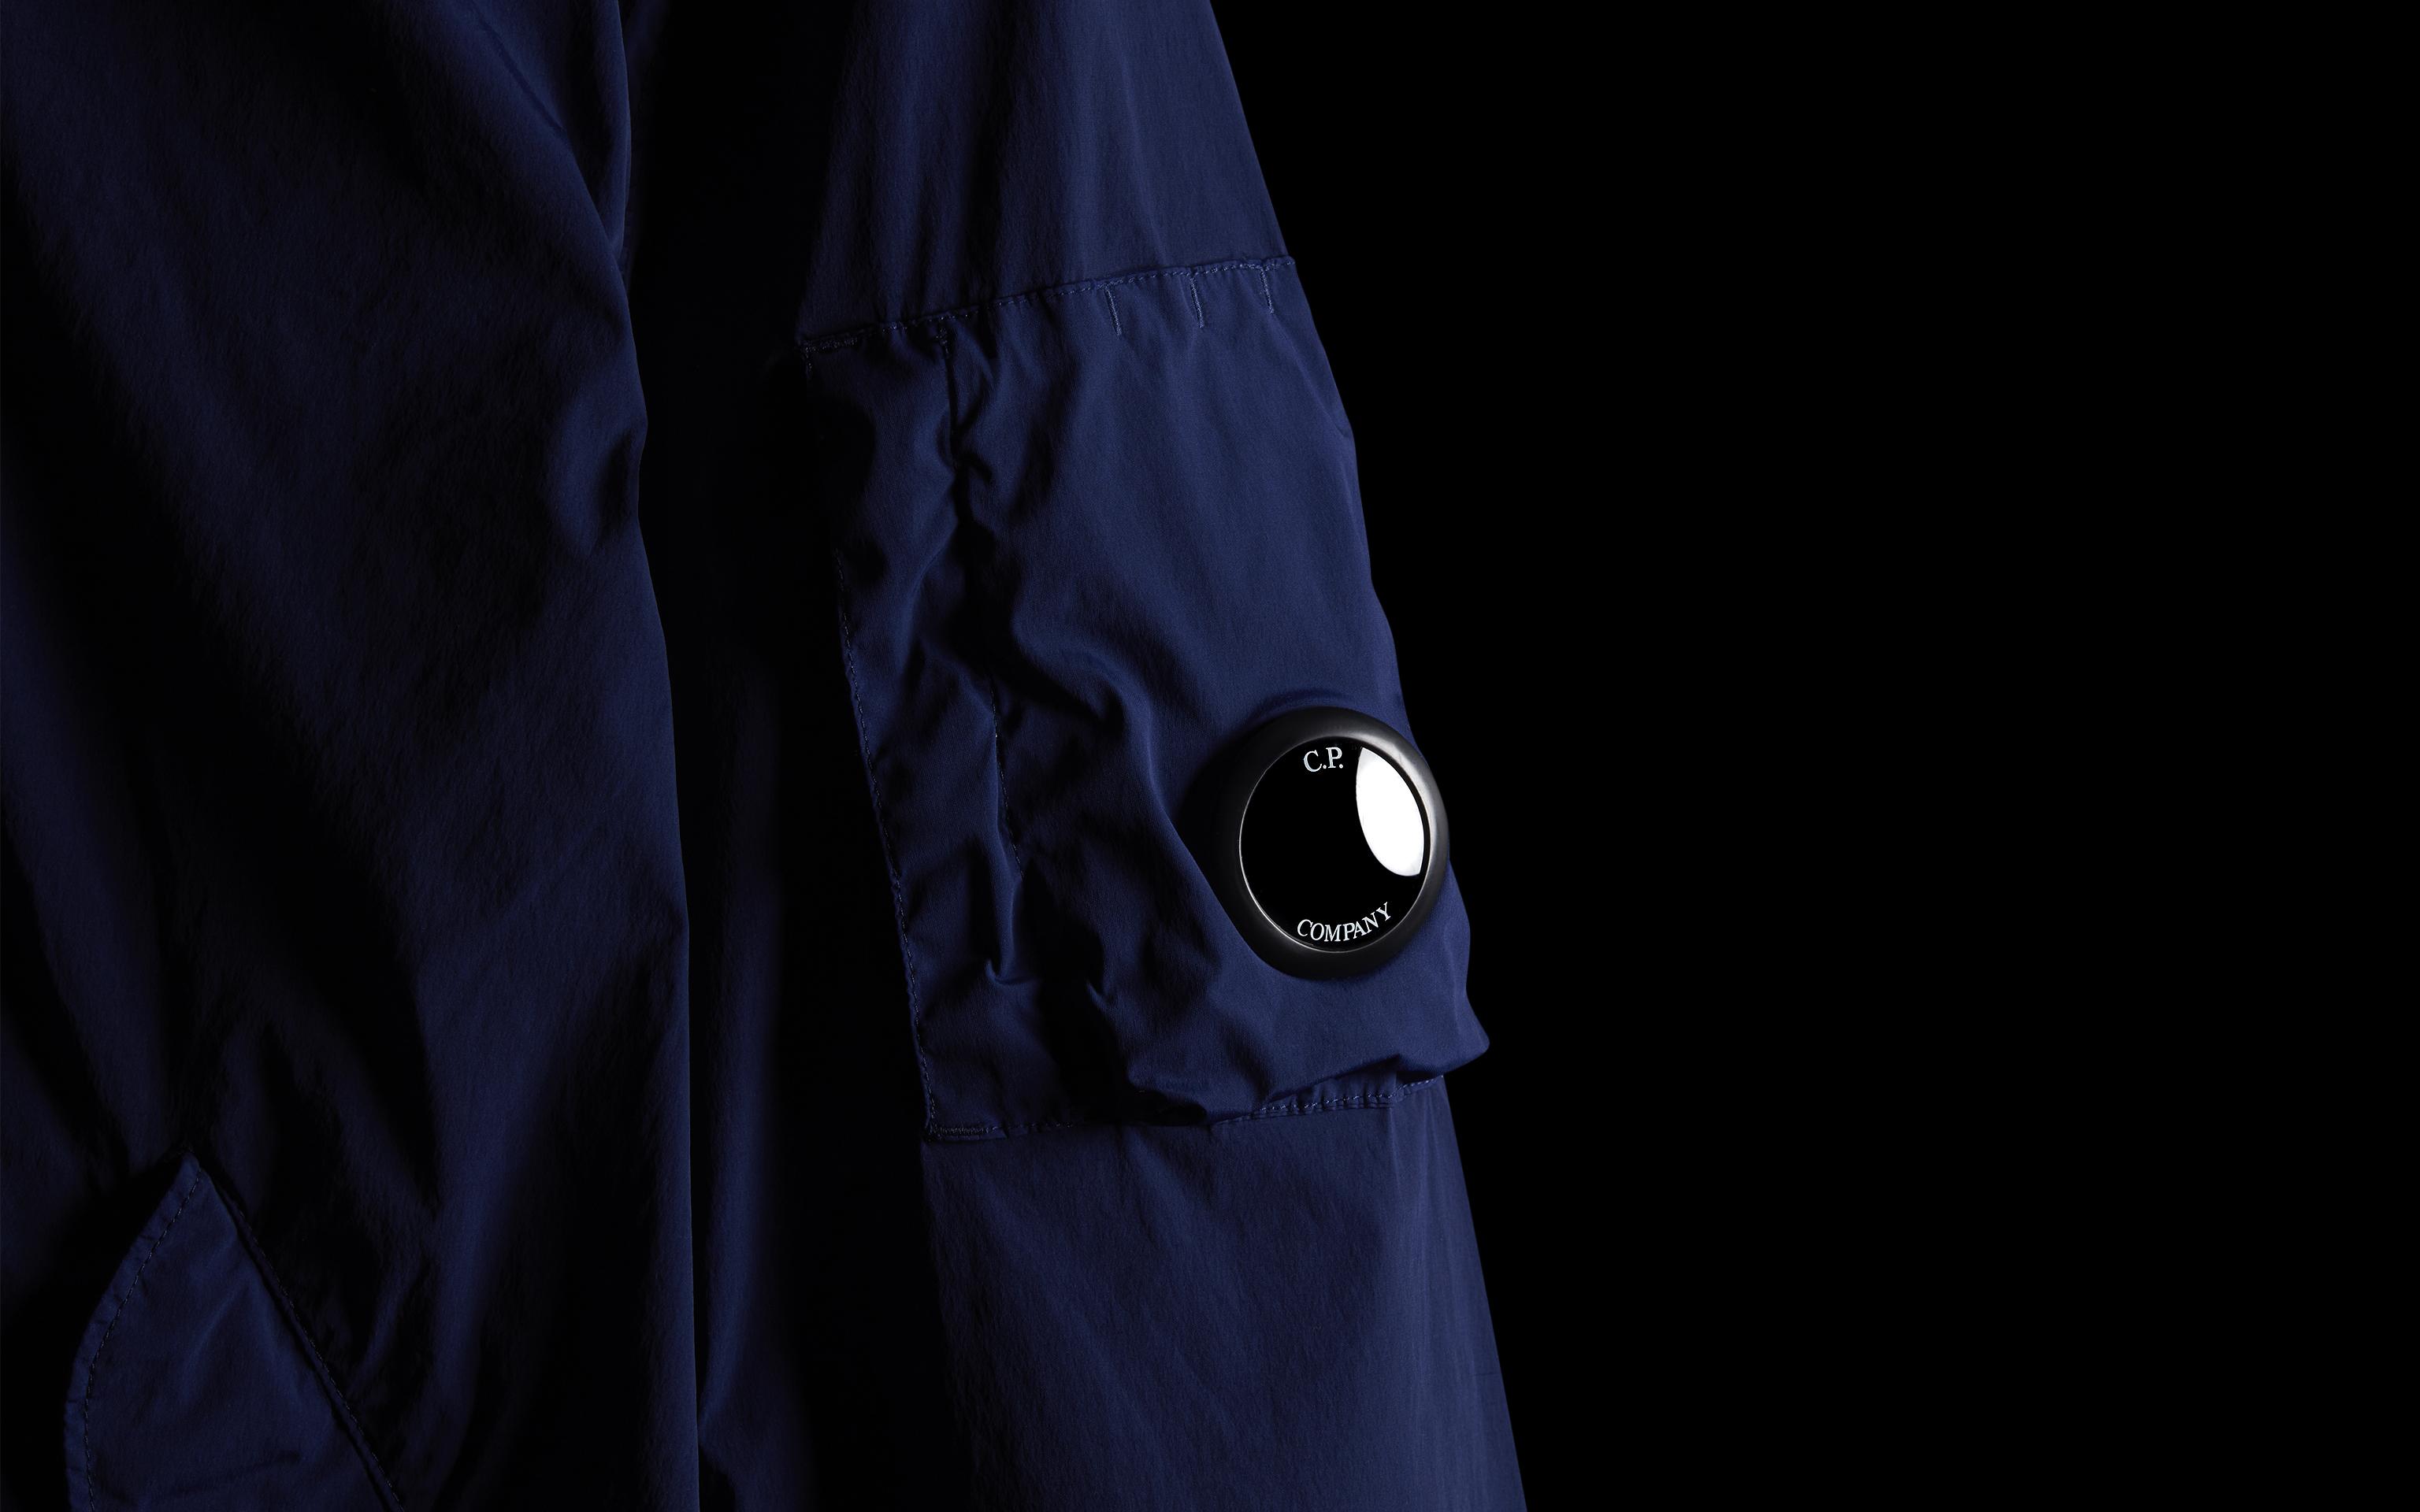 C.P. Brand blue jacket shot in the black background